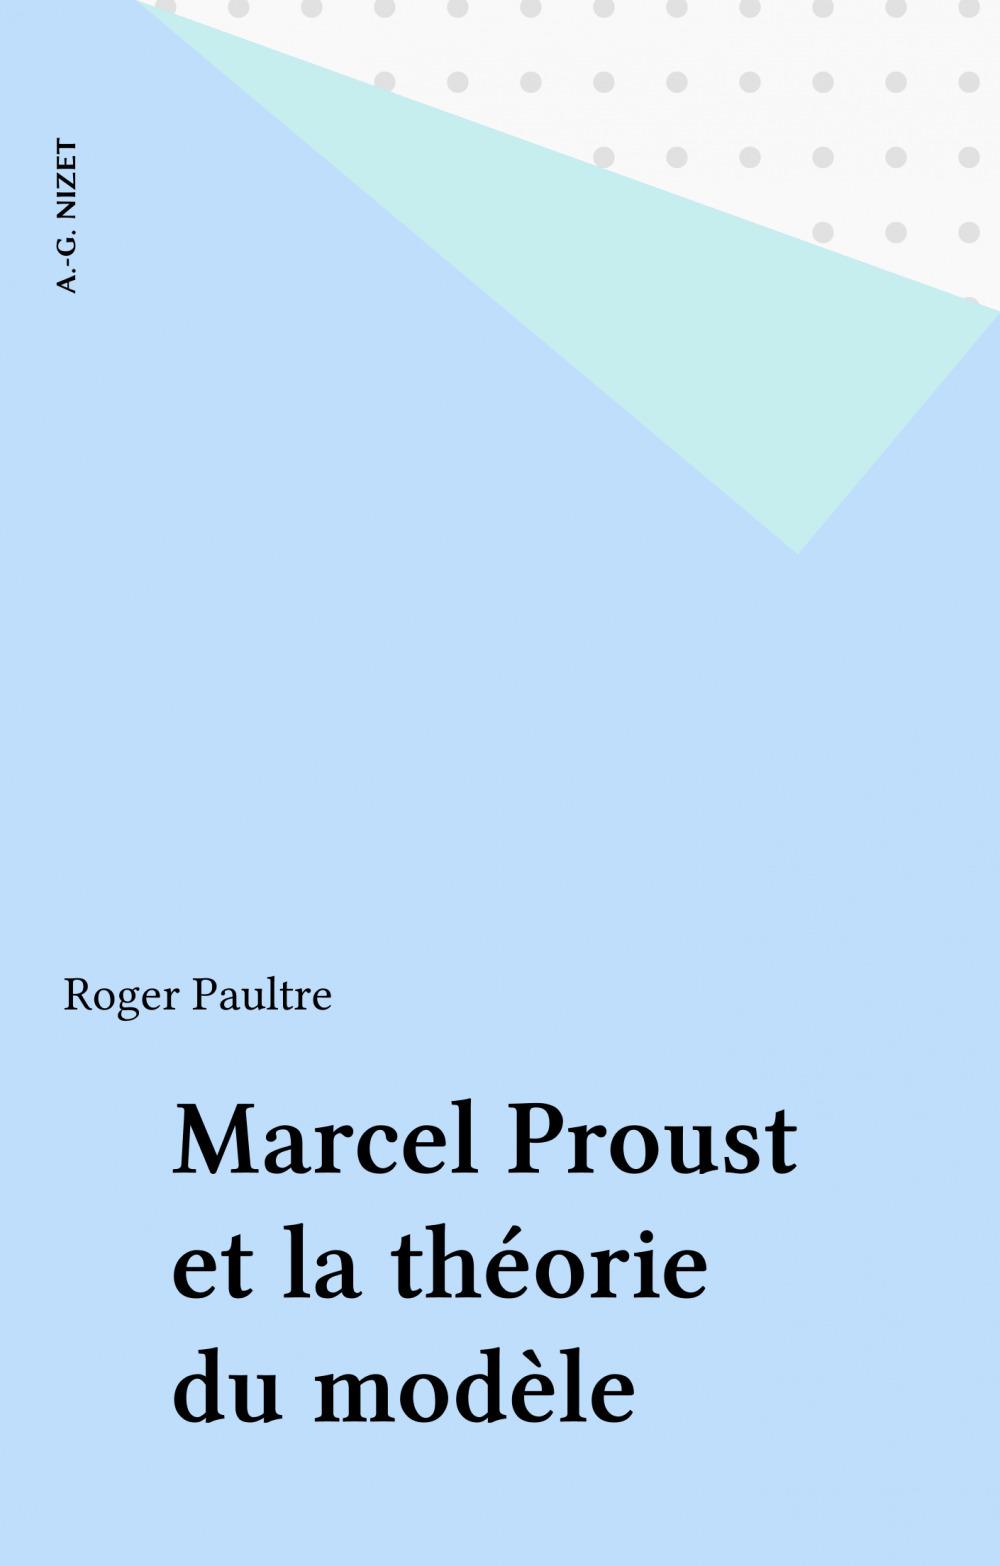 Marcel proust et la theorie du modele.